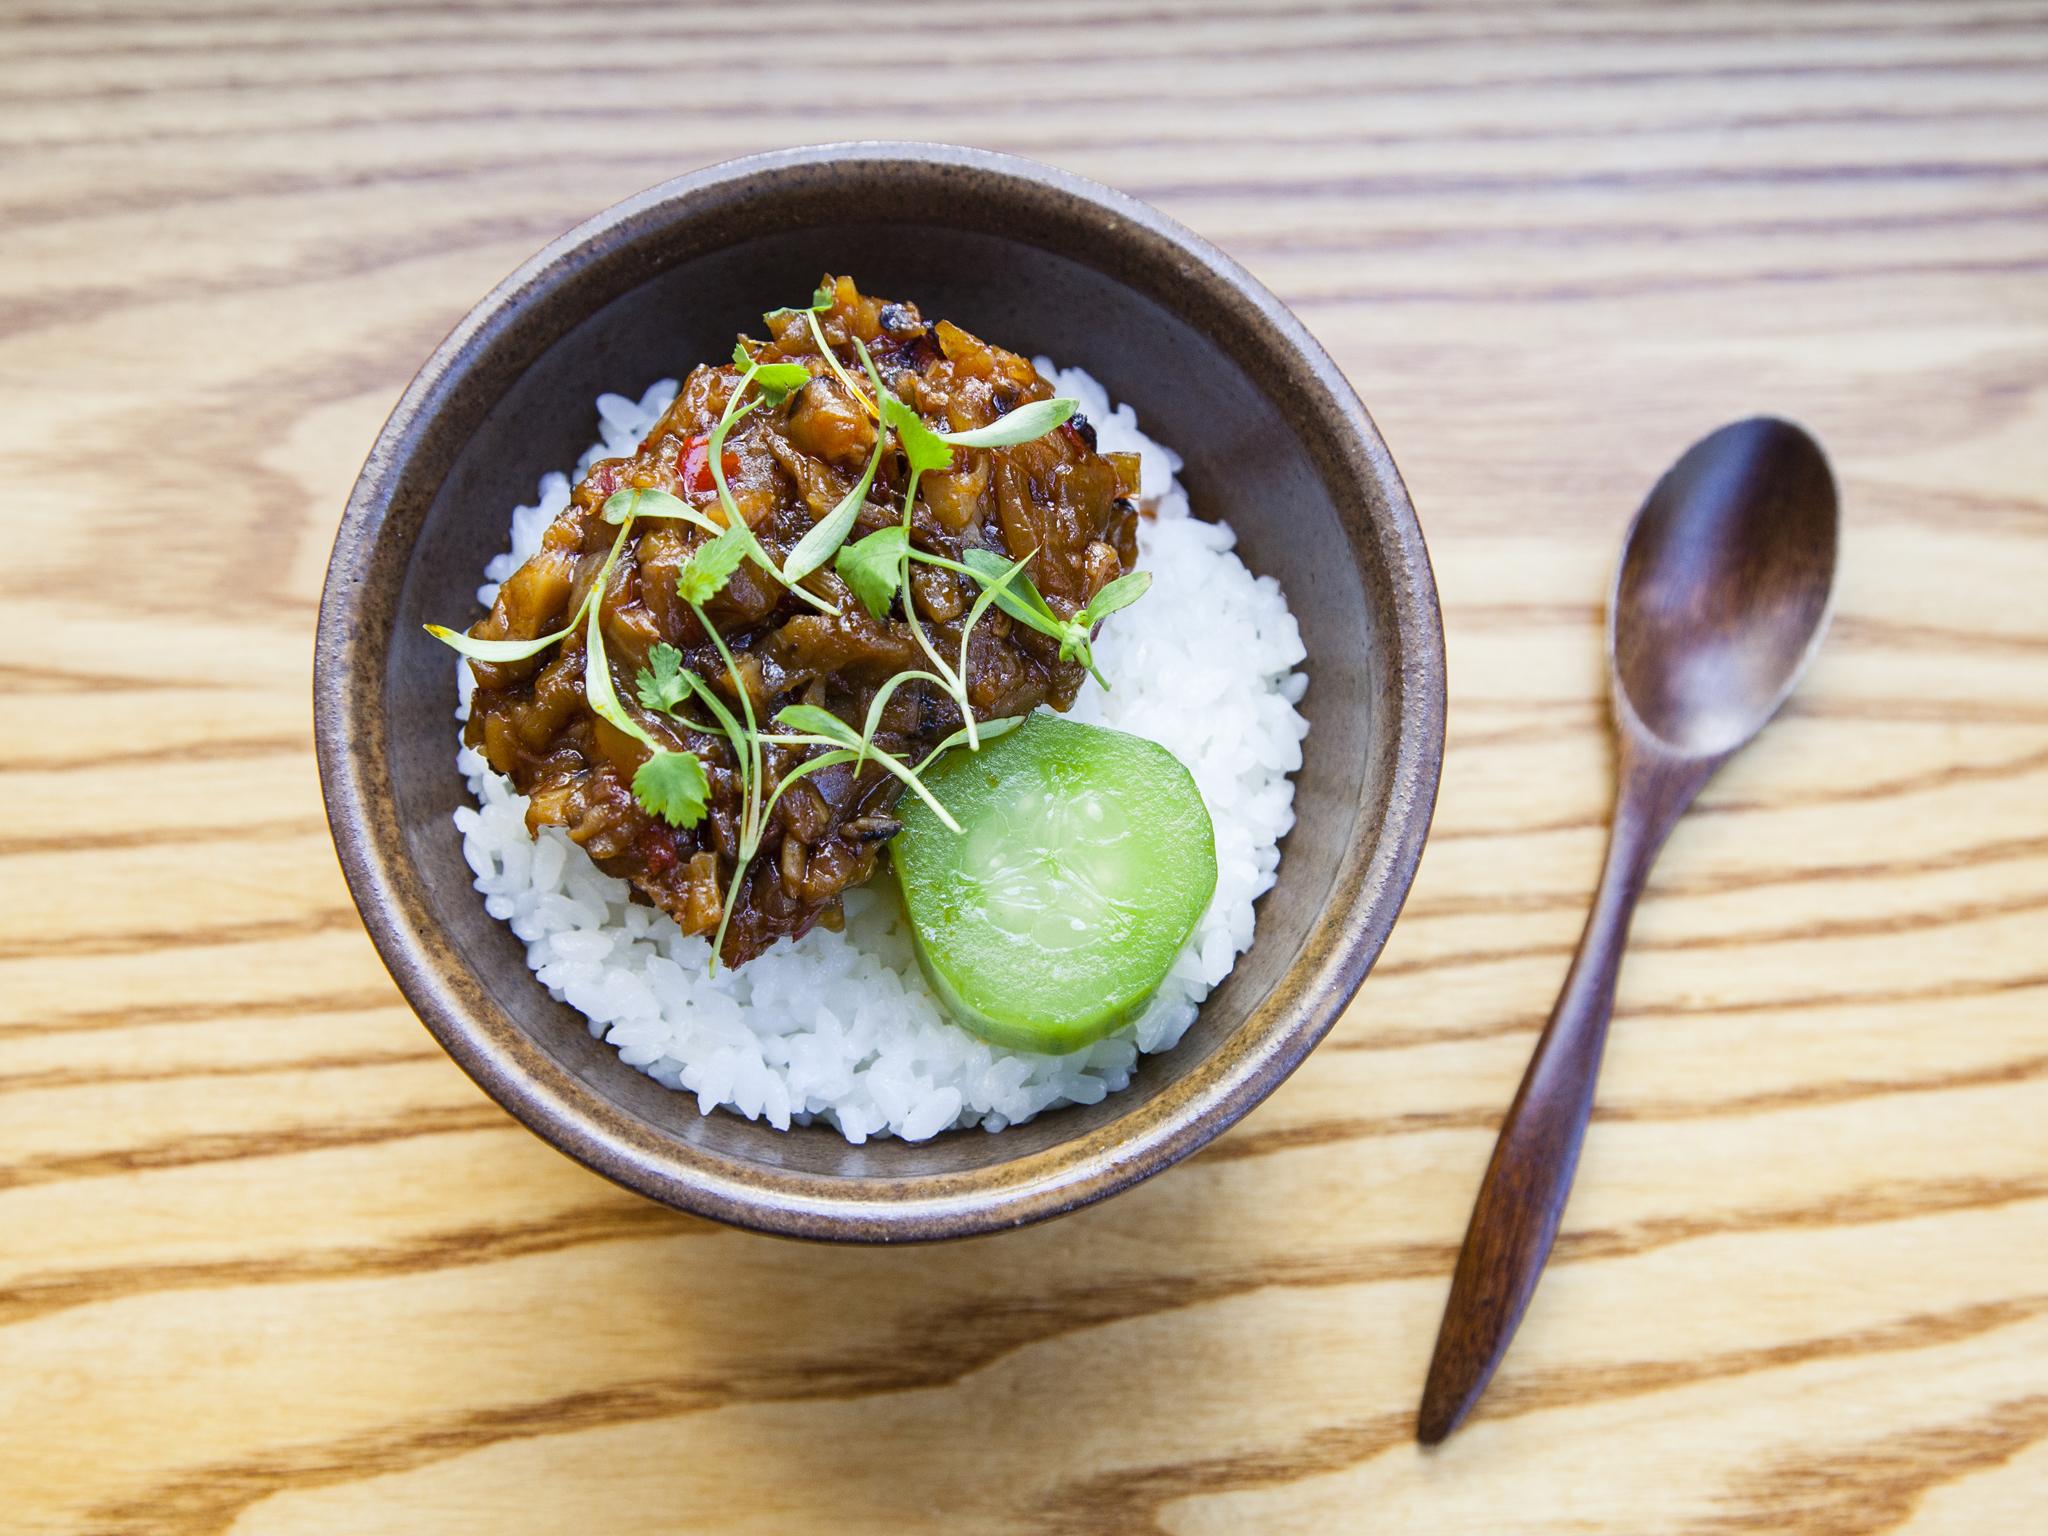 The ten best vegan dishes in London